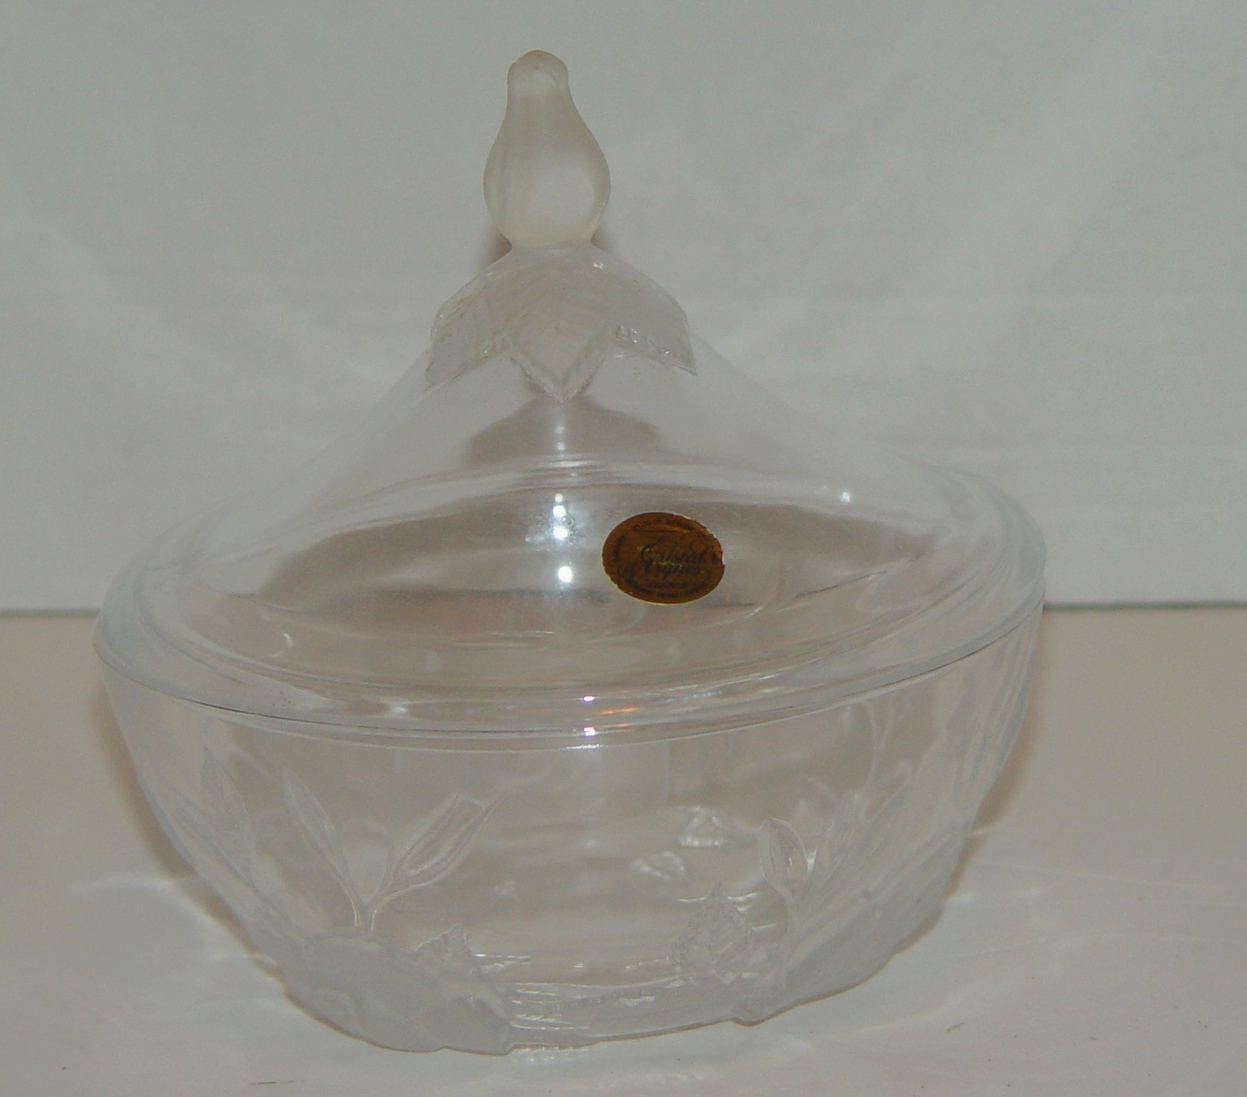 Cristal d Arques, Paris, France, 24% Lead Crystal Covered Bowl - $19.00